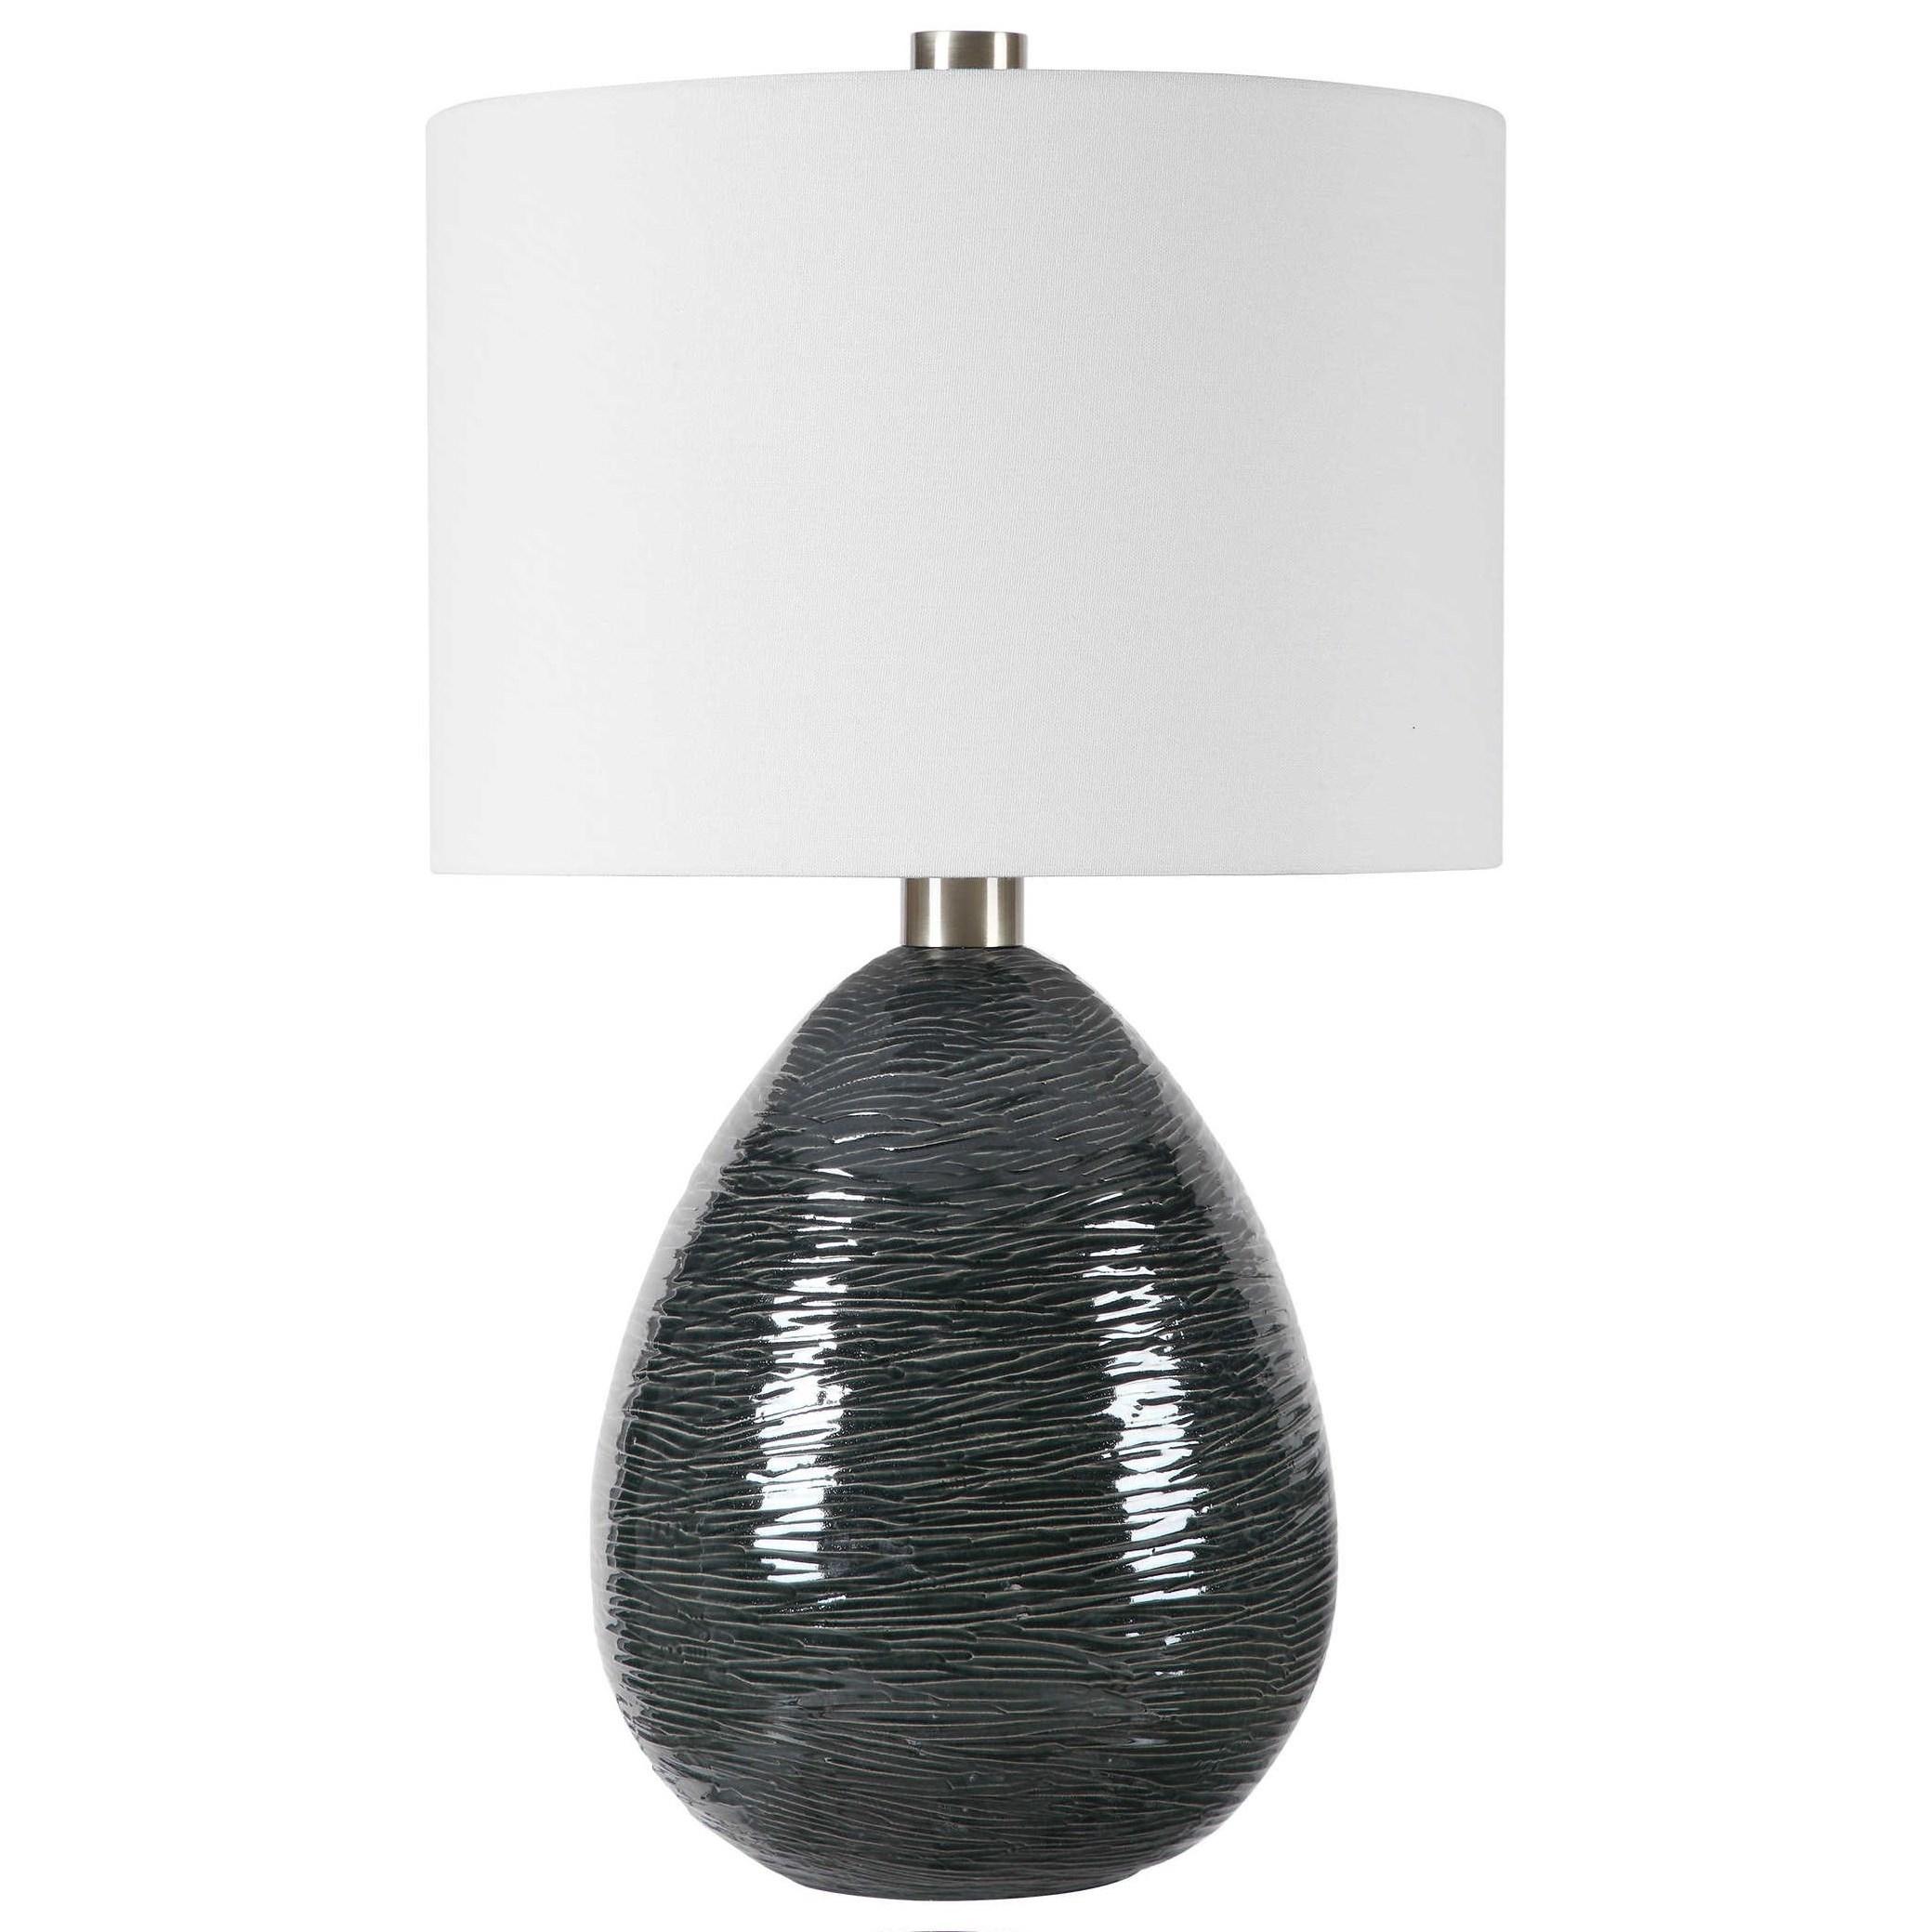 Arikara Dark Teal Table Lamp